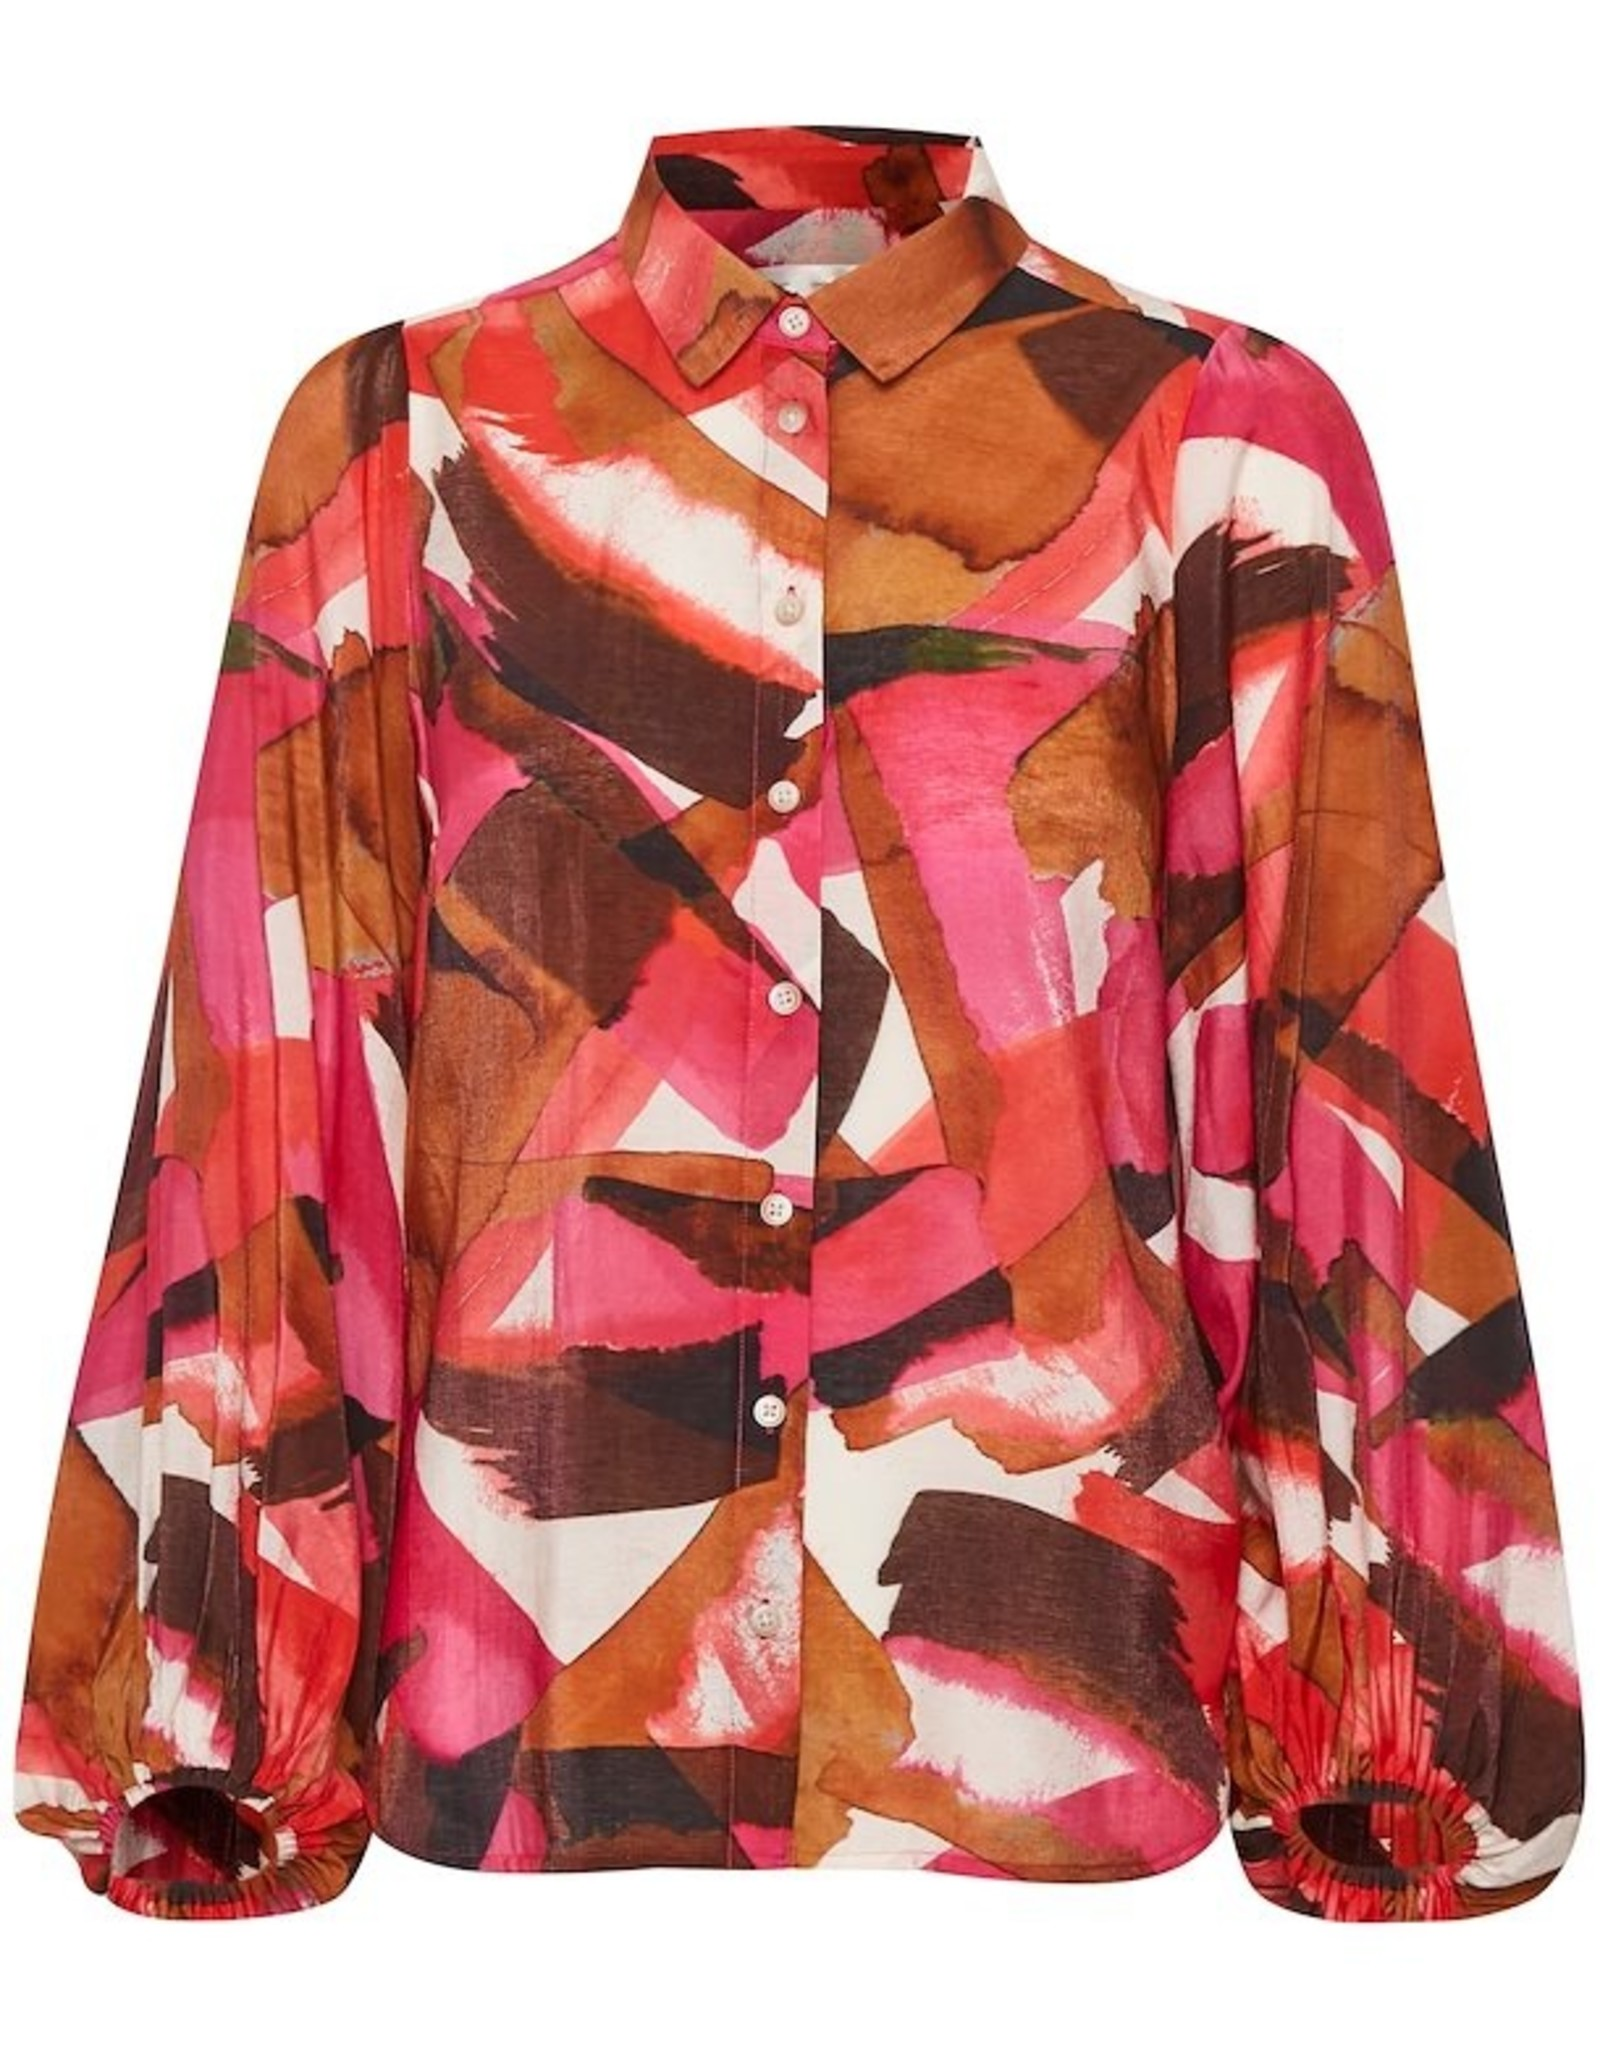 InWear Poppy Shirt Pink Watercolour